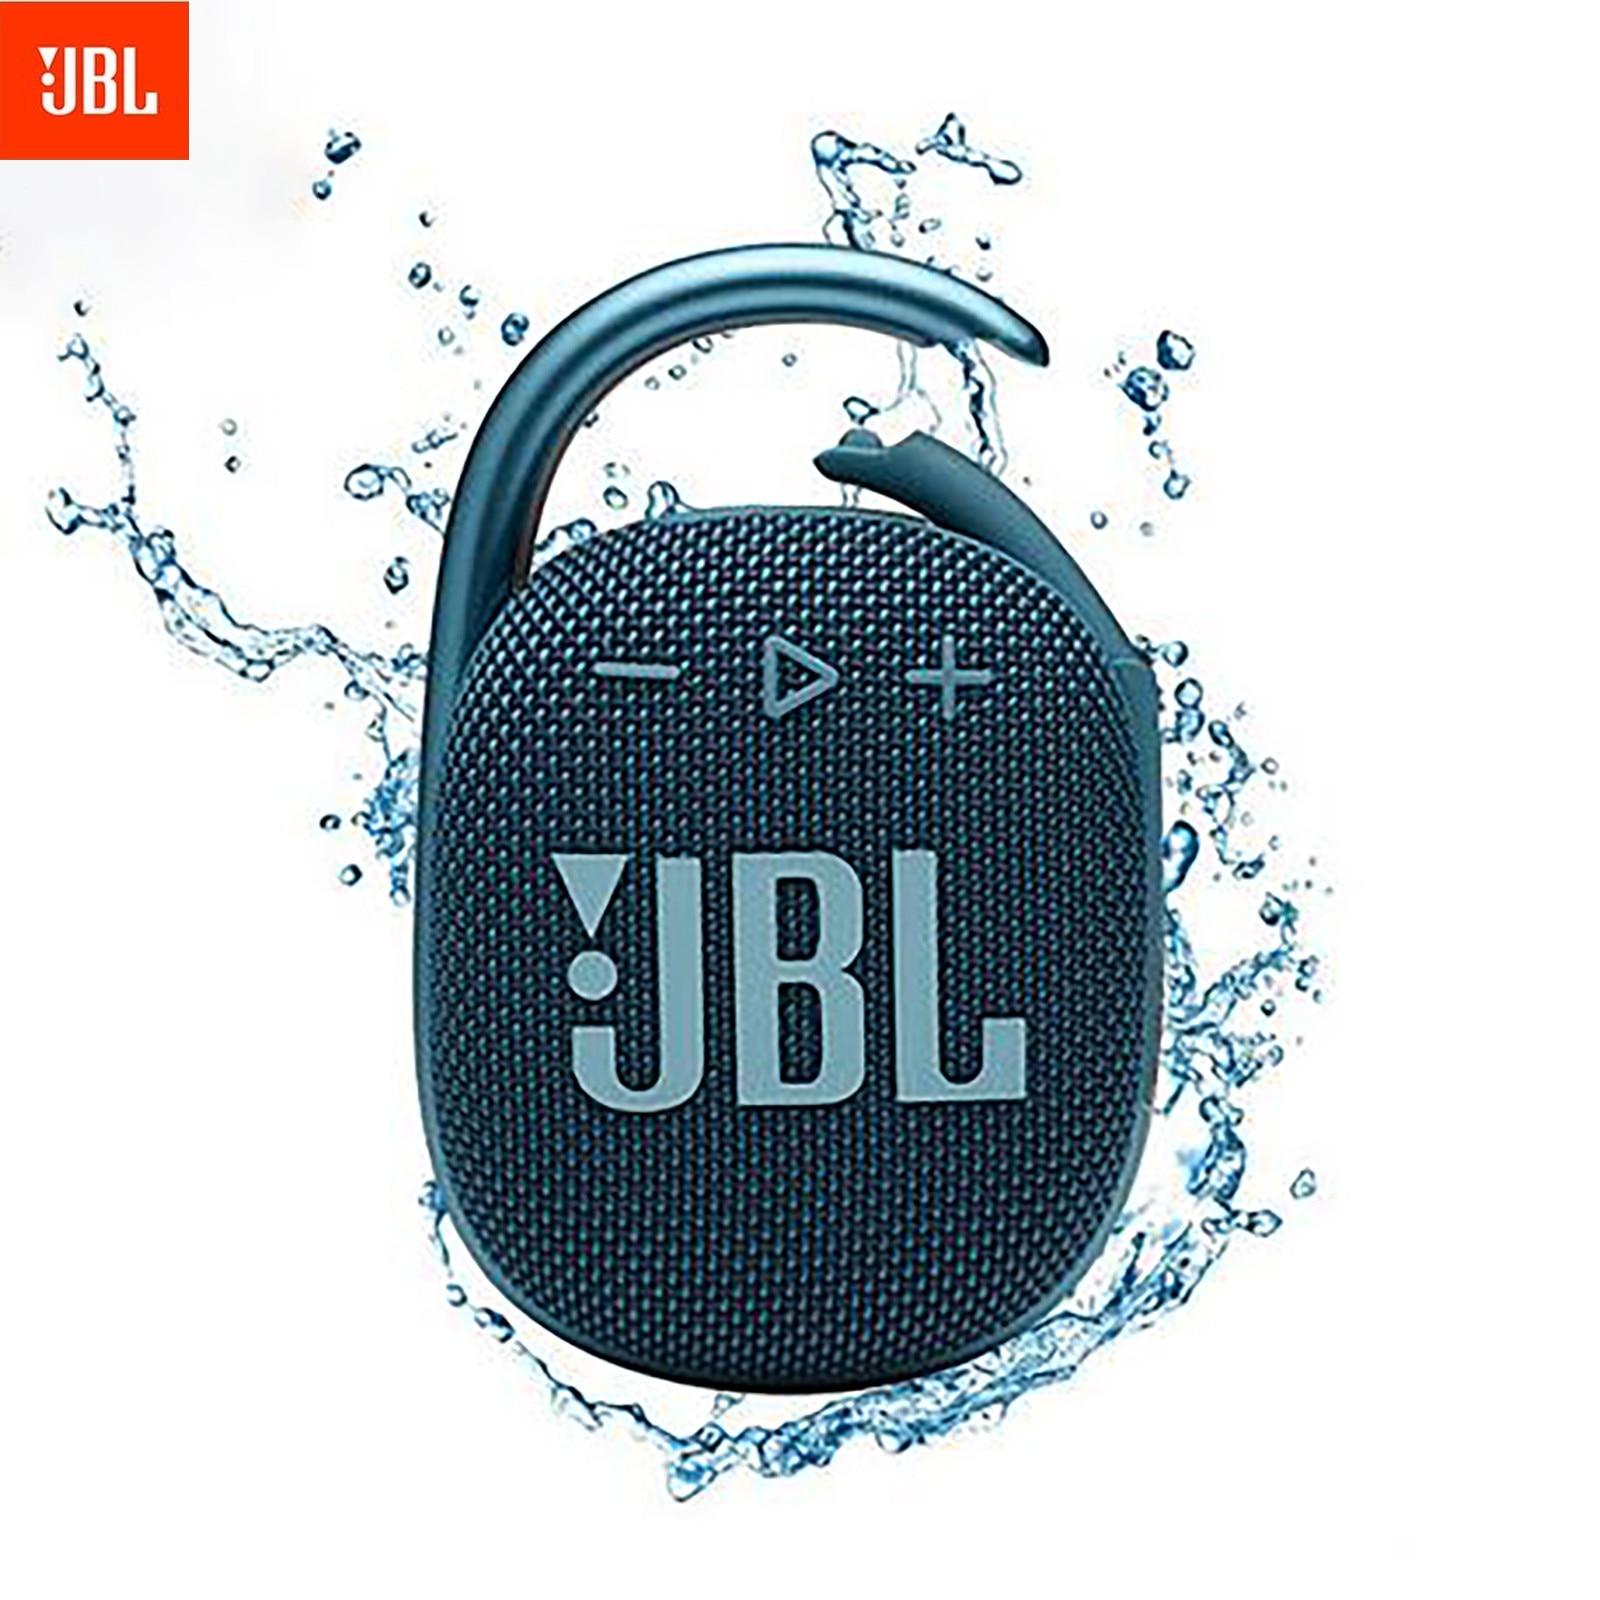 Jbl קליפ 4 Bluetooth נייד רמקול סאב חיצוני רמקול מיני רמקול Ip67 Dustproof ועמיד למים #3